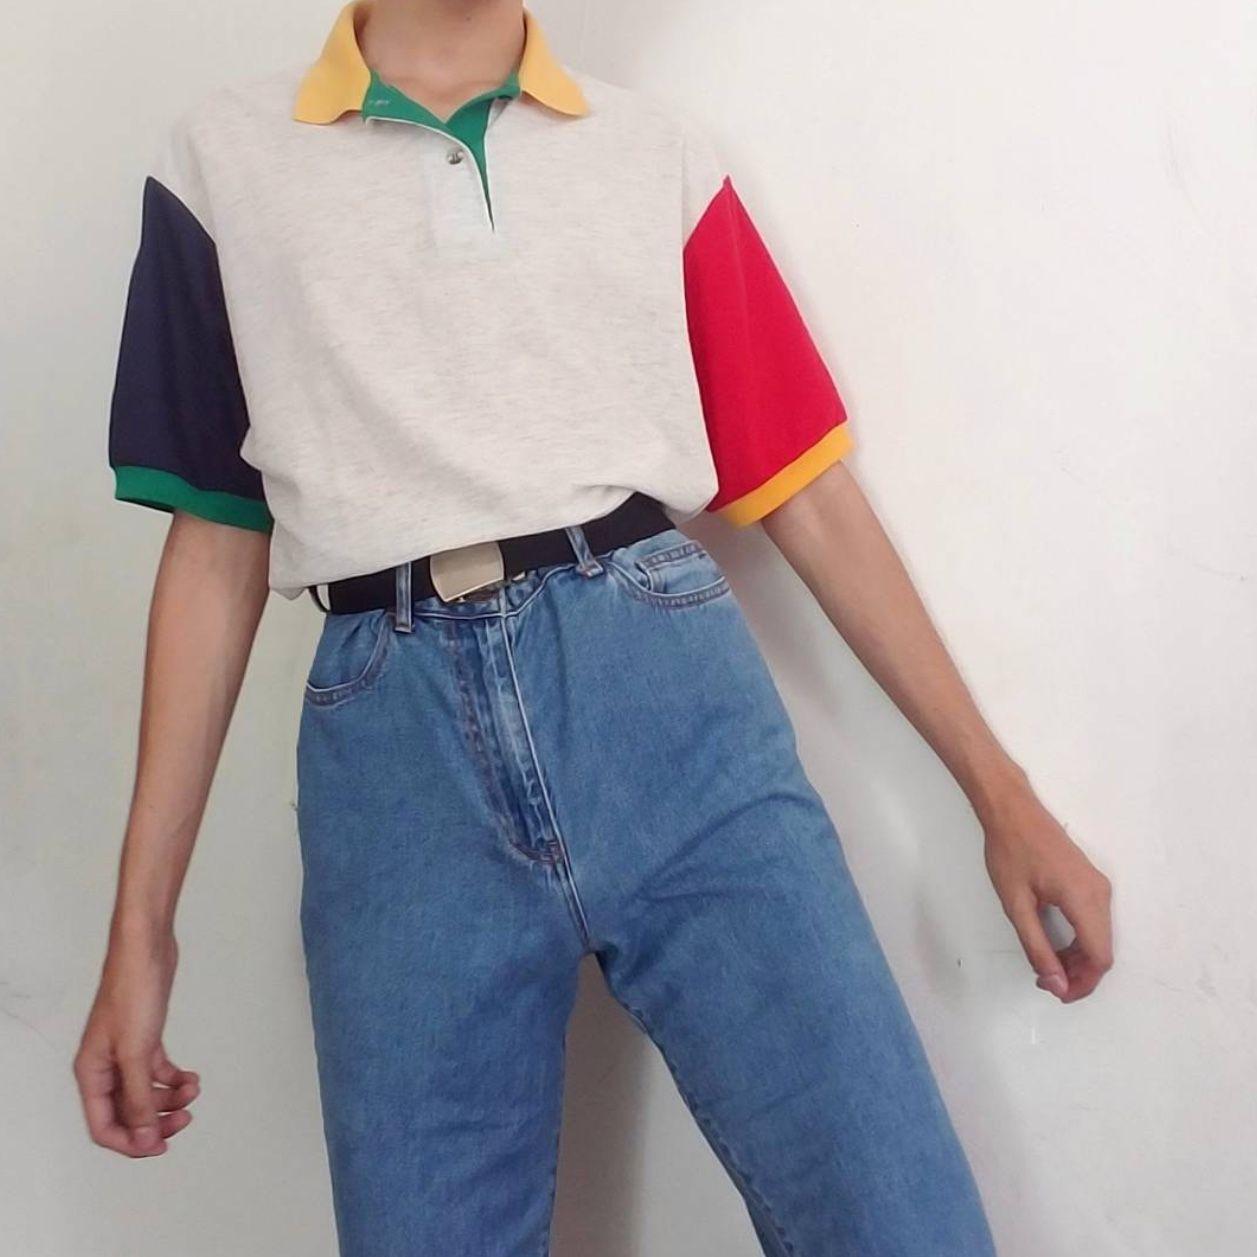 80s Fashion (photo Not Mine)